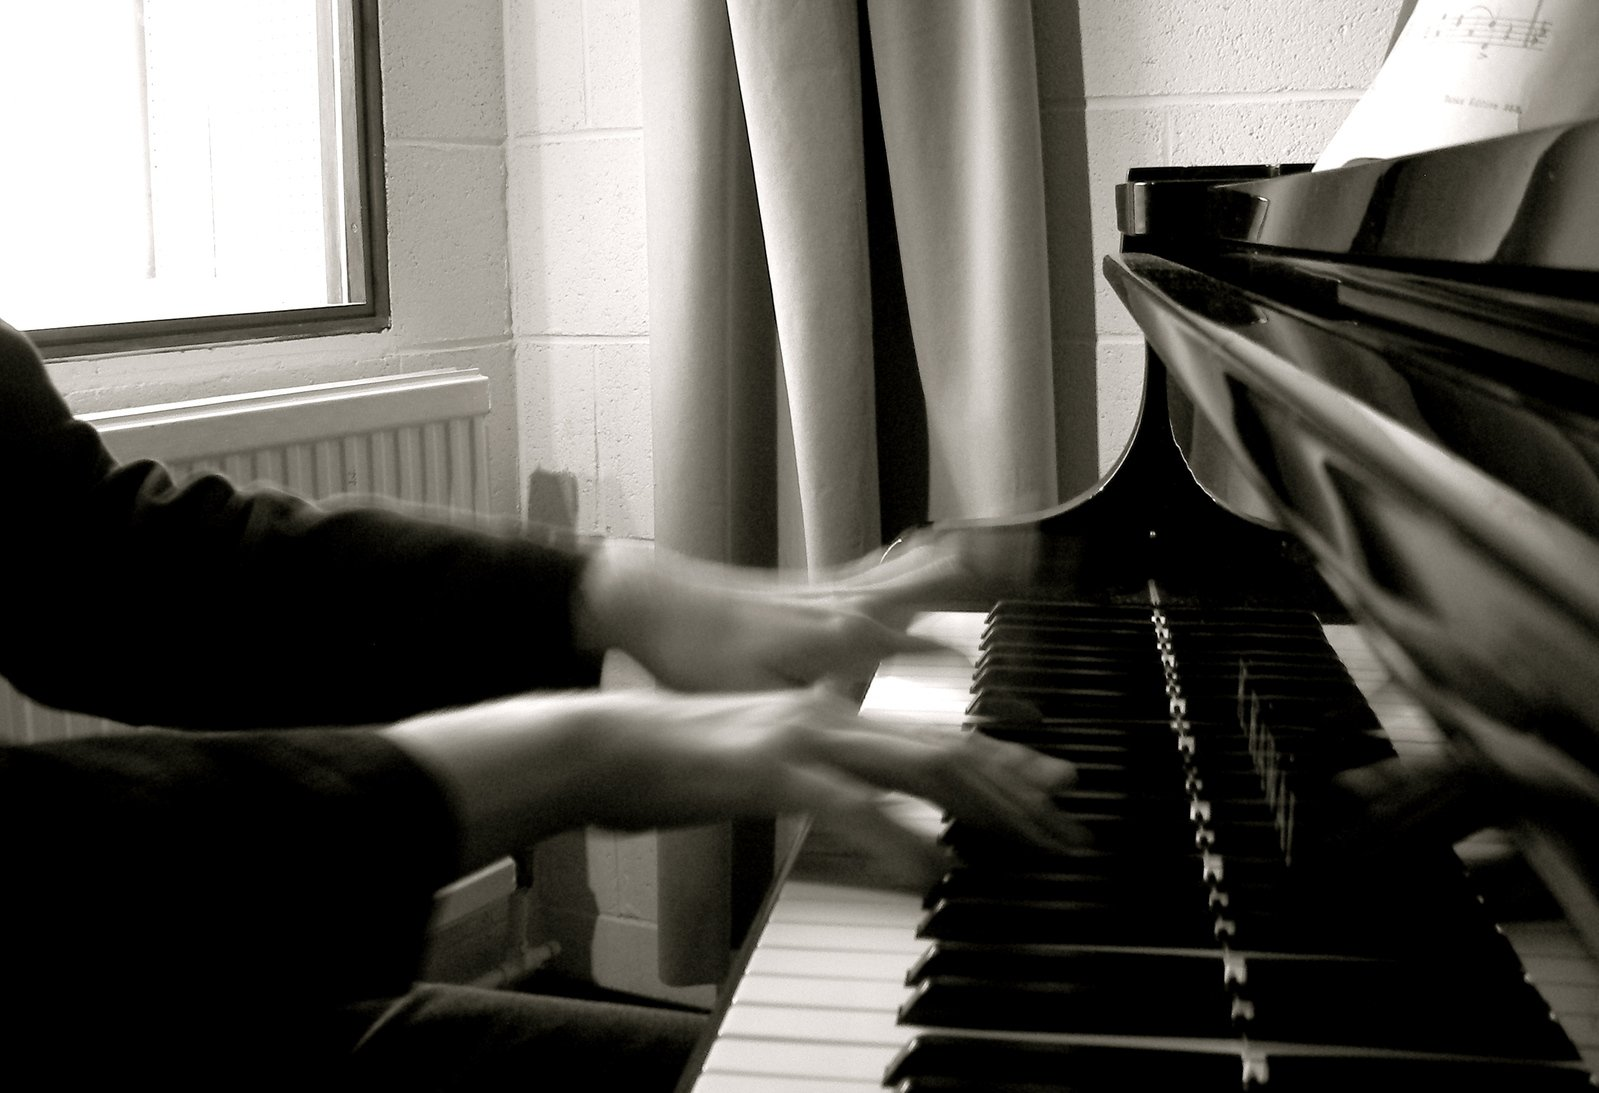 Картинки с пианино и руками